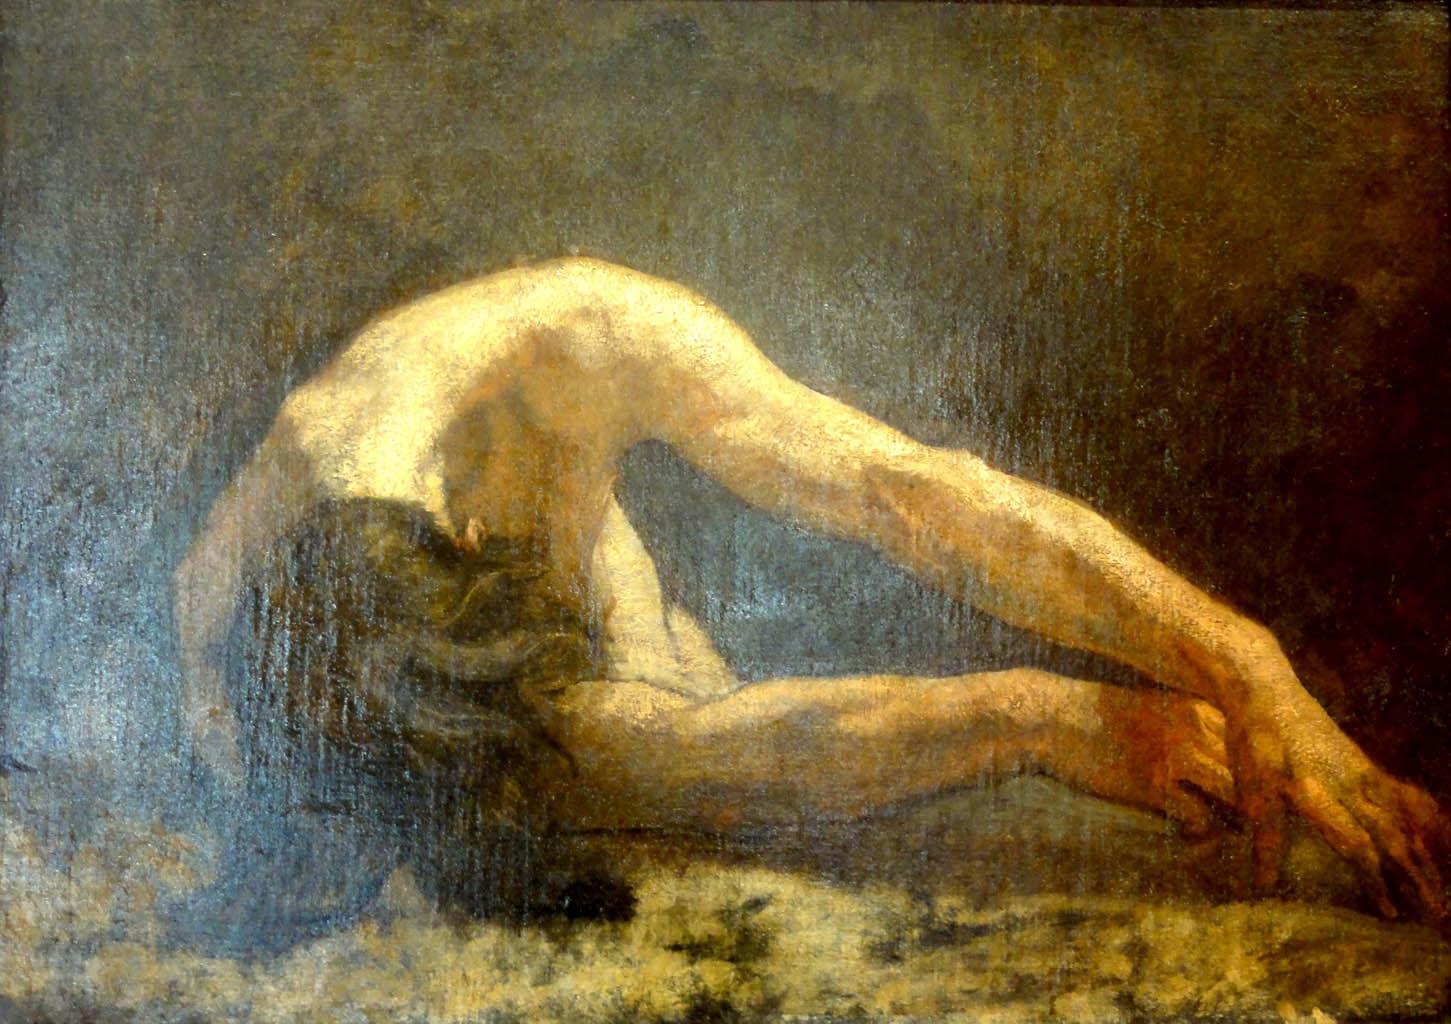 Тома Кутюр (Thomas Couture), Etude d'homme